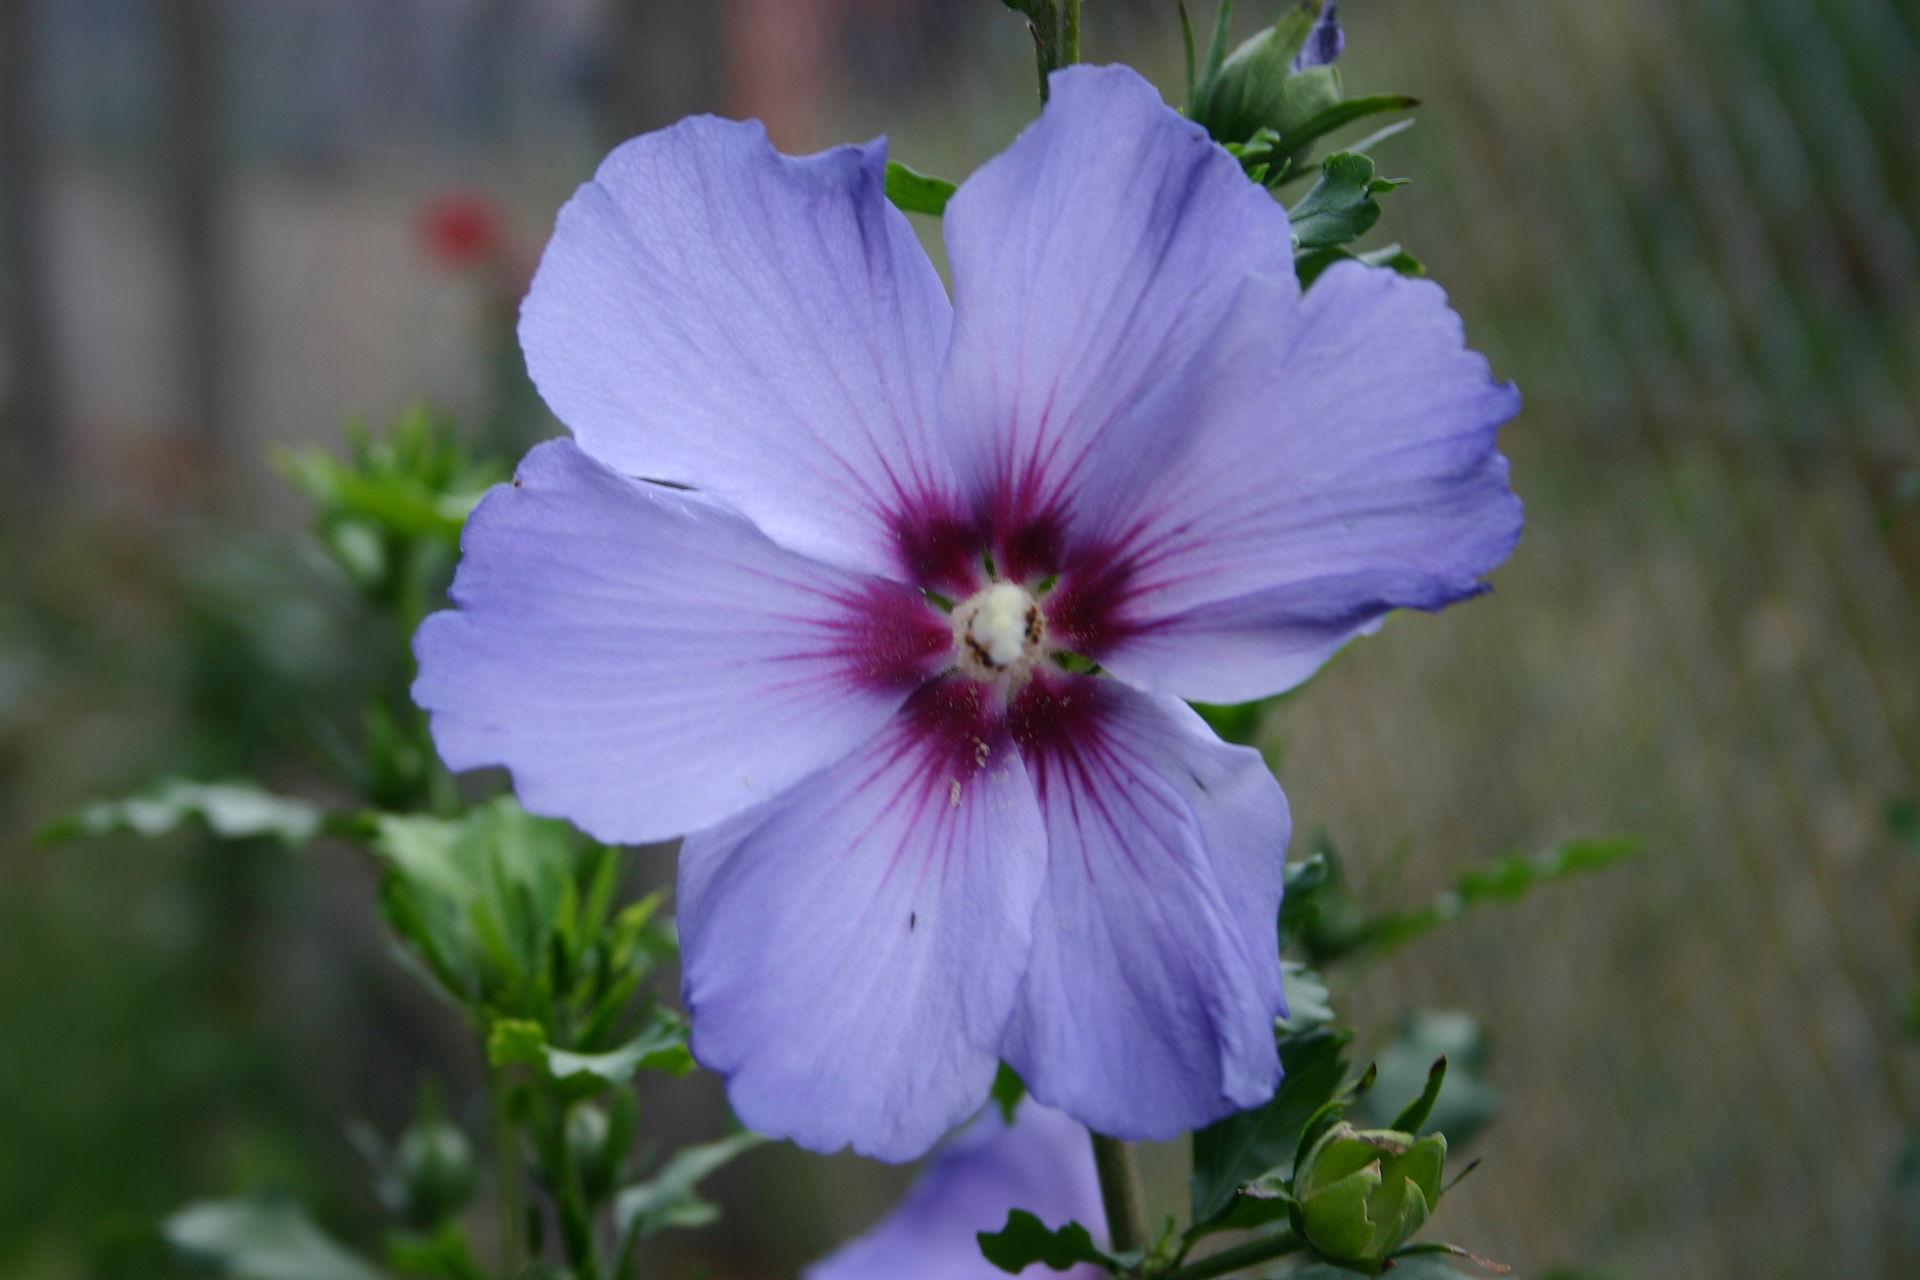 Pharaphrasing the purple hibiscus